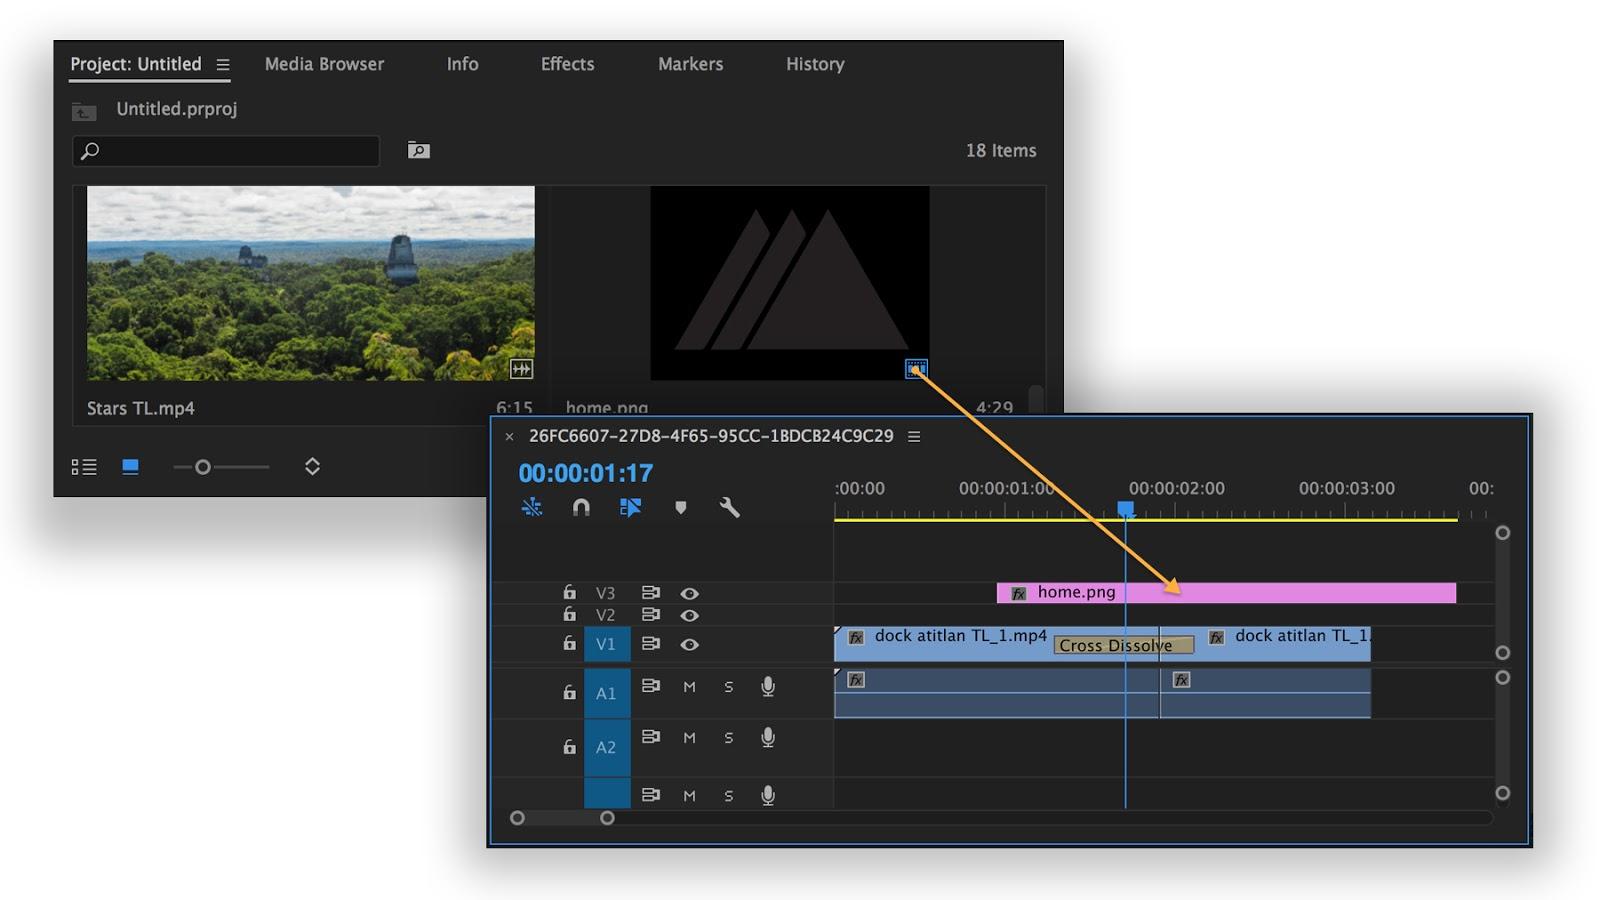 Bổ sung graphic cho sản phẩm video